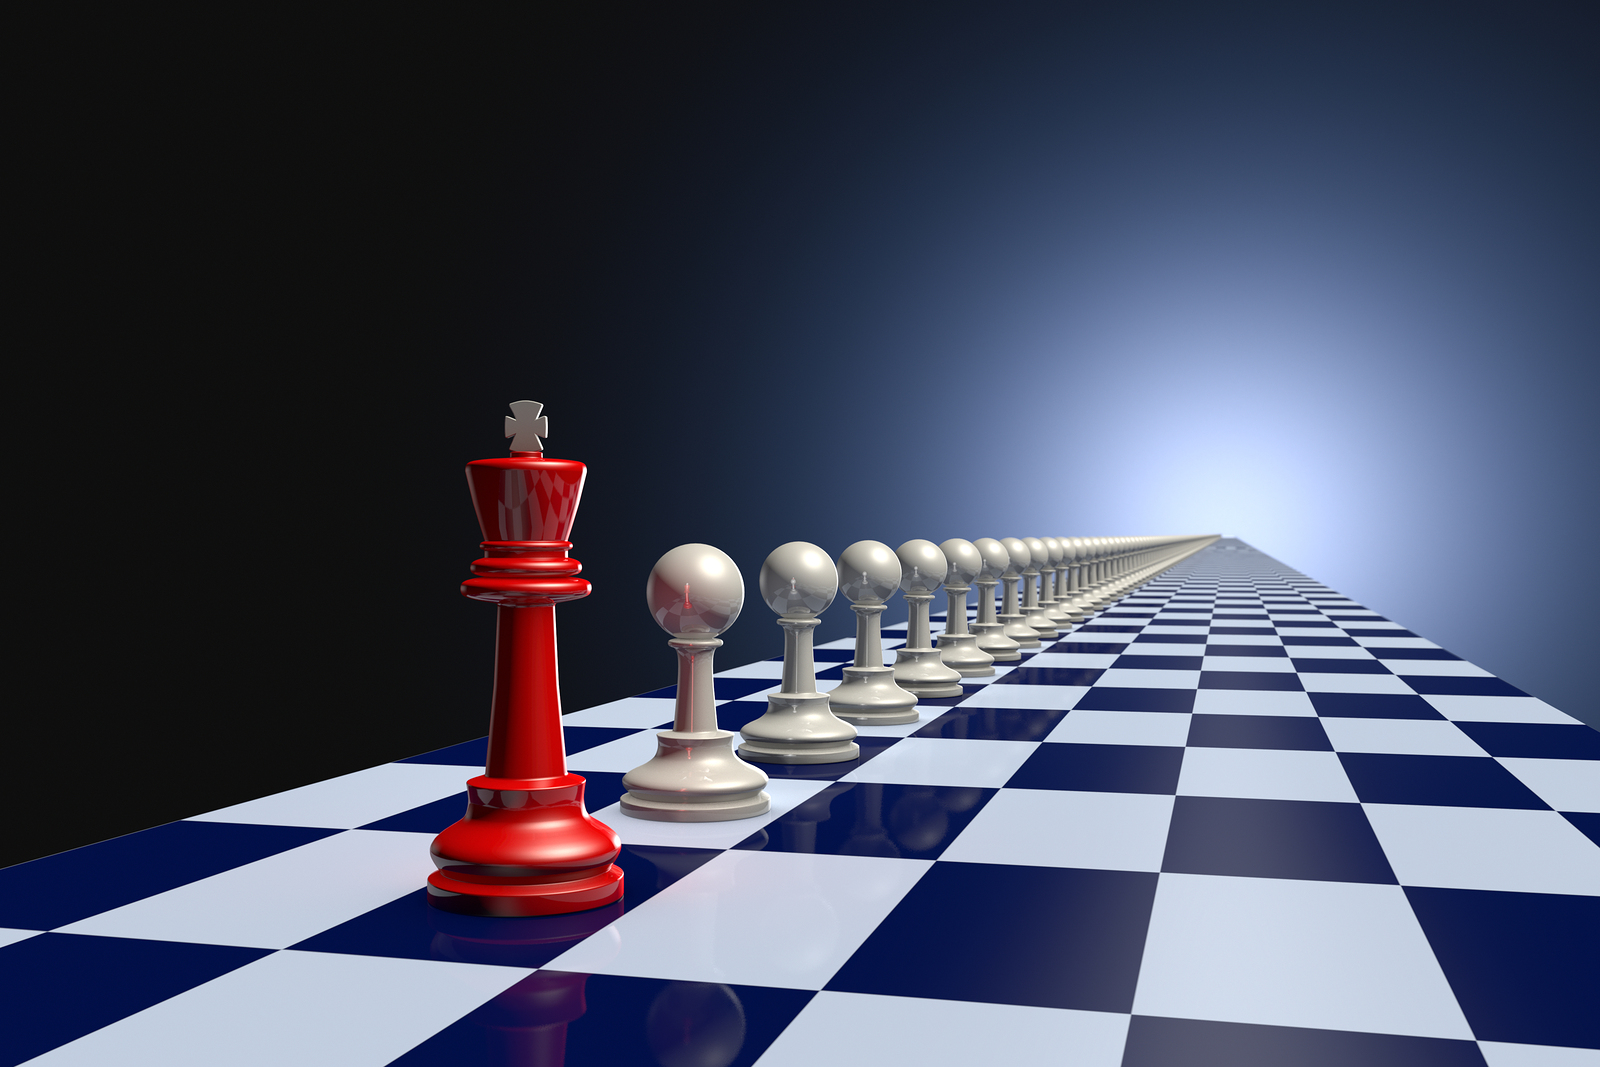 bigstock-Avant-garde-chess-Army--104648840.jpg